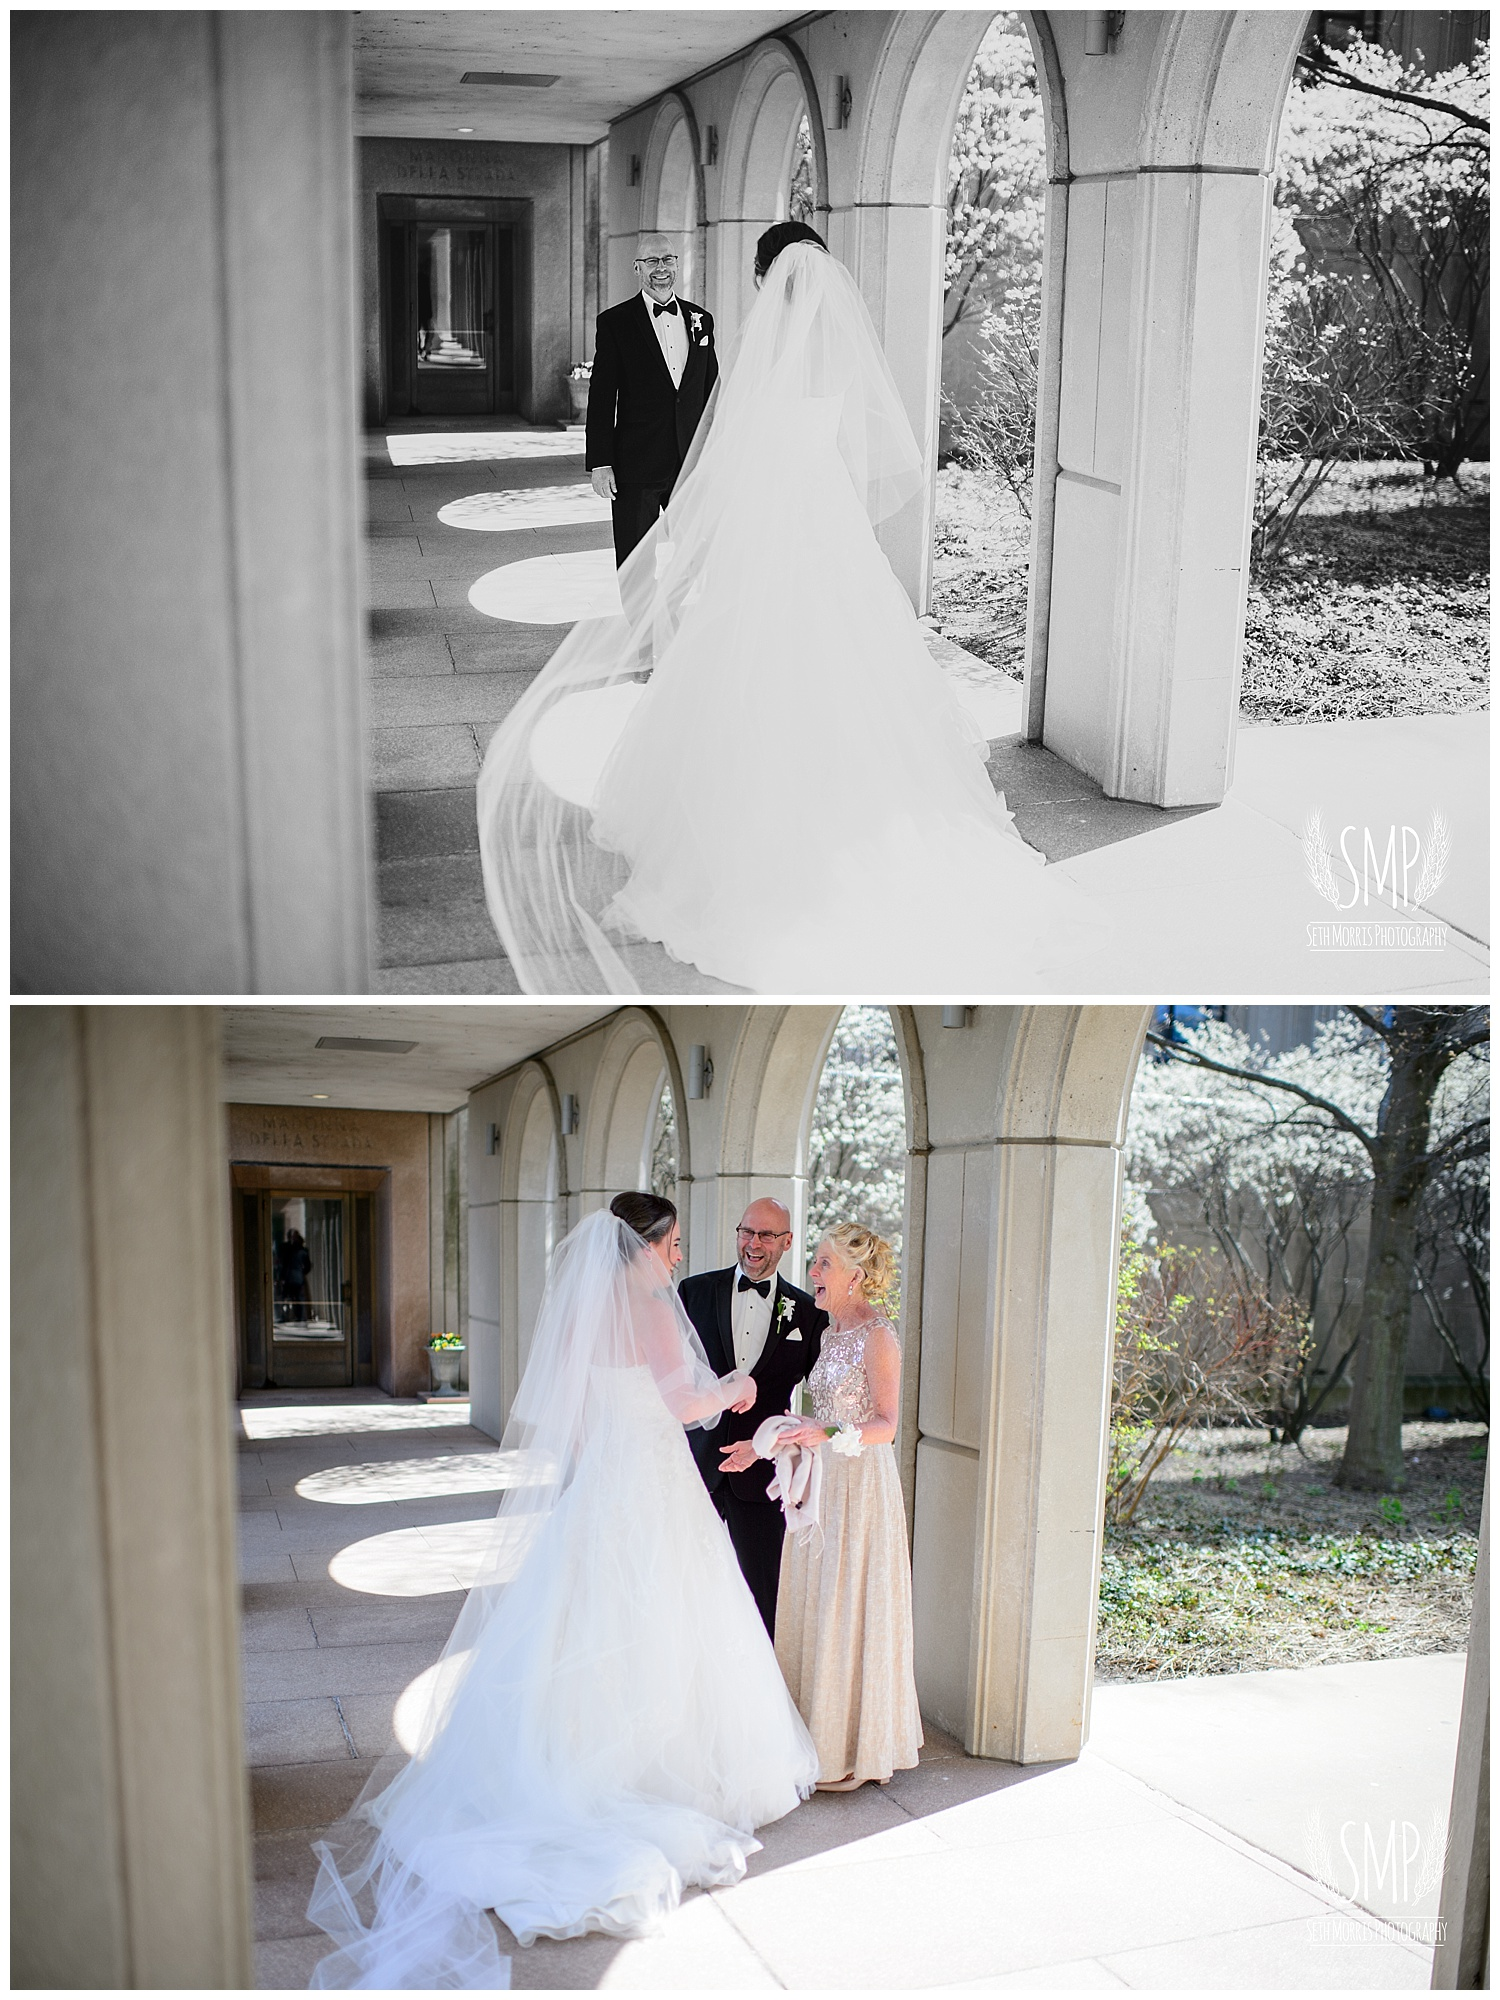 chicago-wedding-pictures-del-strada-hotel-allegro-43.jpg